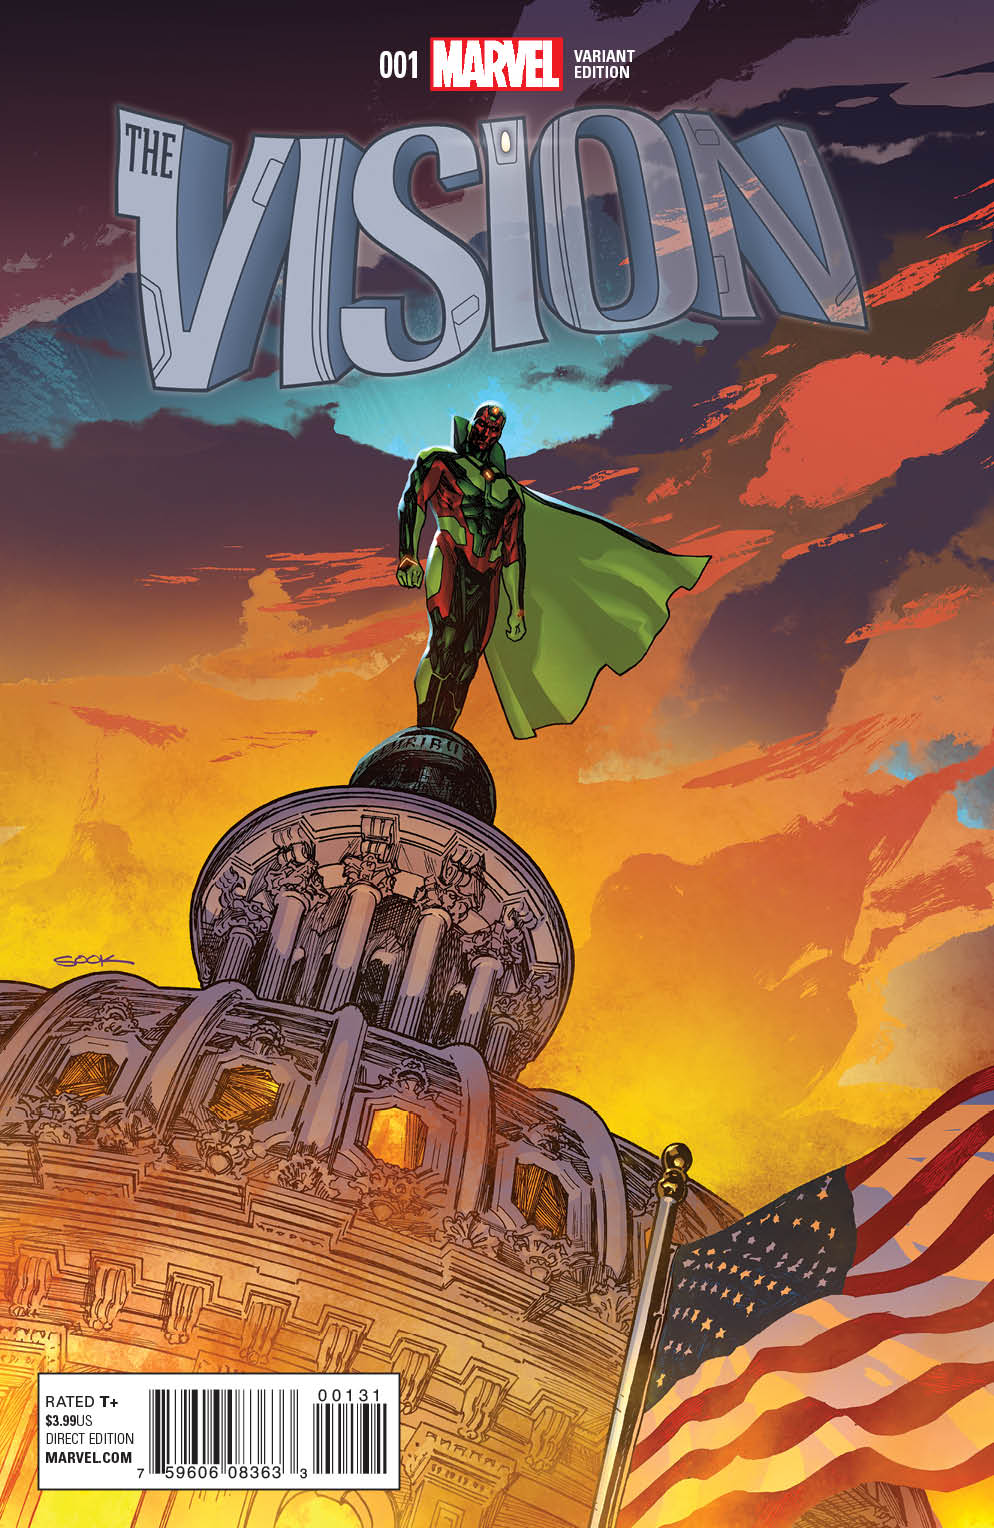 The_Vision_1_Sook_Variant